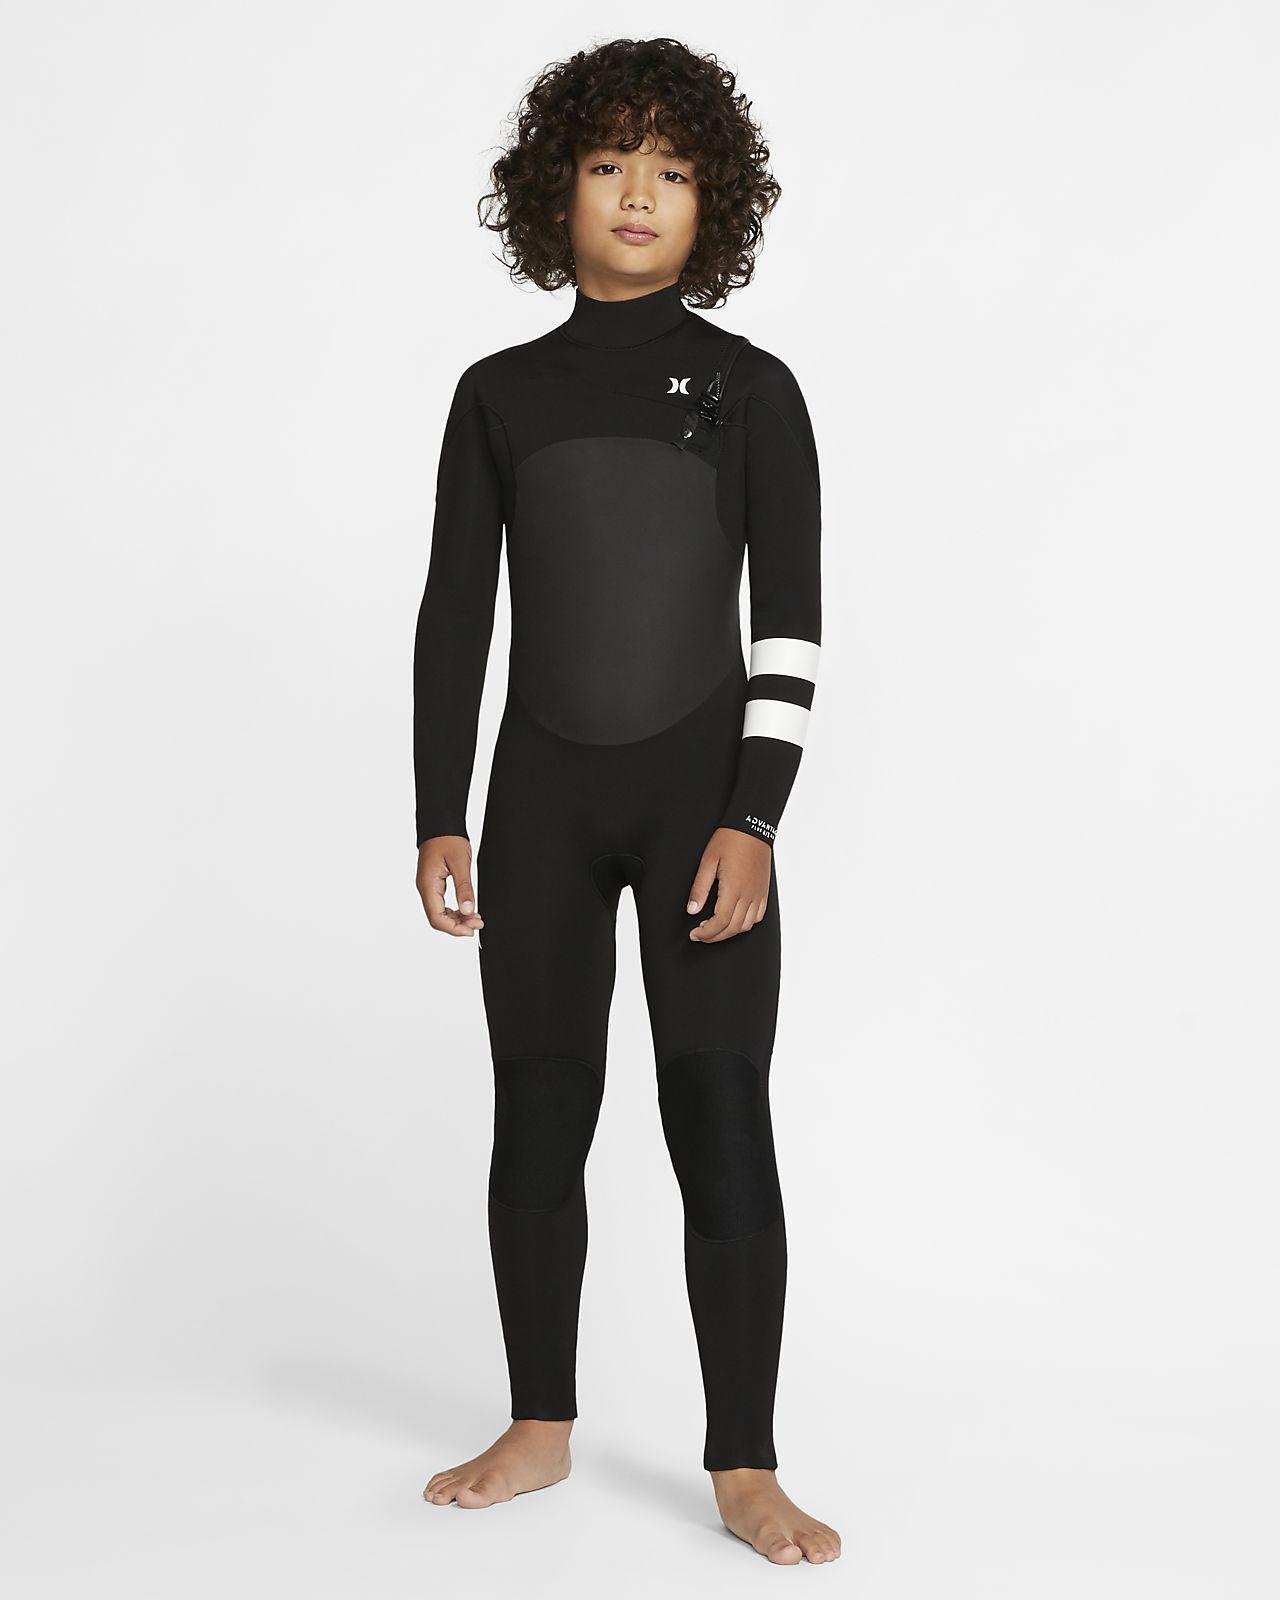 Hurley Advantage Plus 4/3mm Fullsuit Çocuk Wetsuit'i